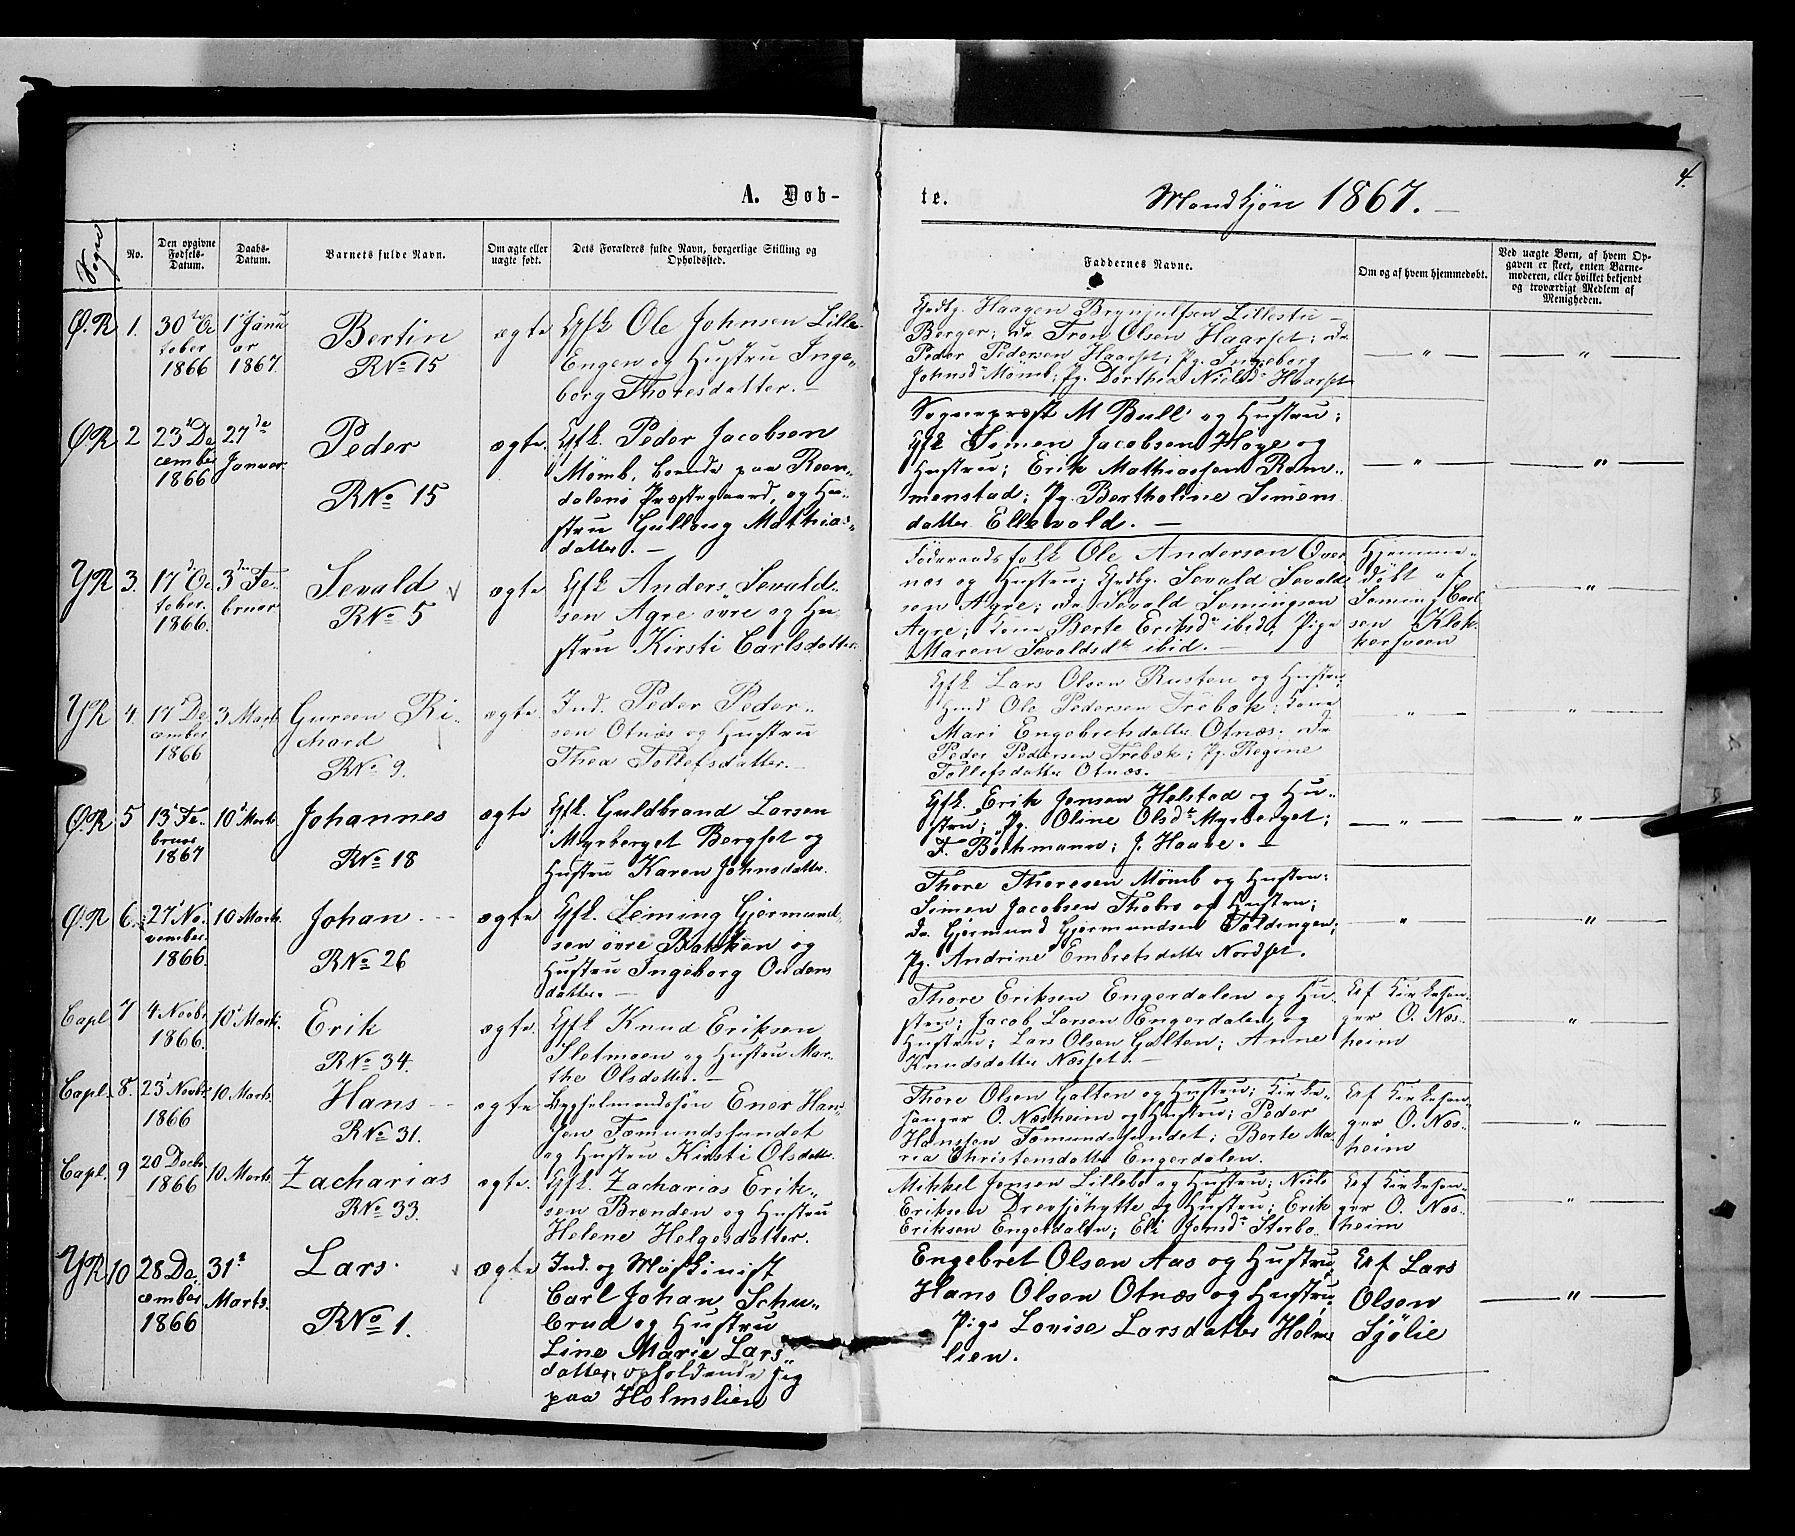 SAH, Rendalen prestekontor, H/Ha/Haa/L0006: Ministerialbok nr. 6, 1867-1877, s. 4